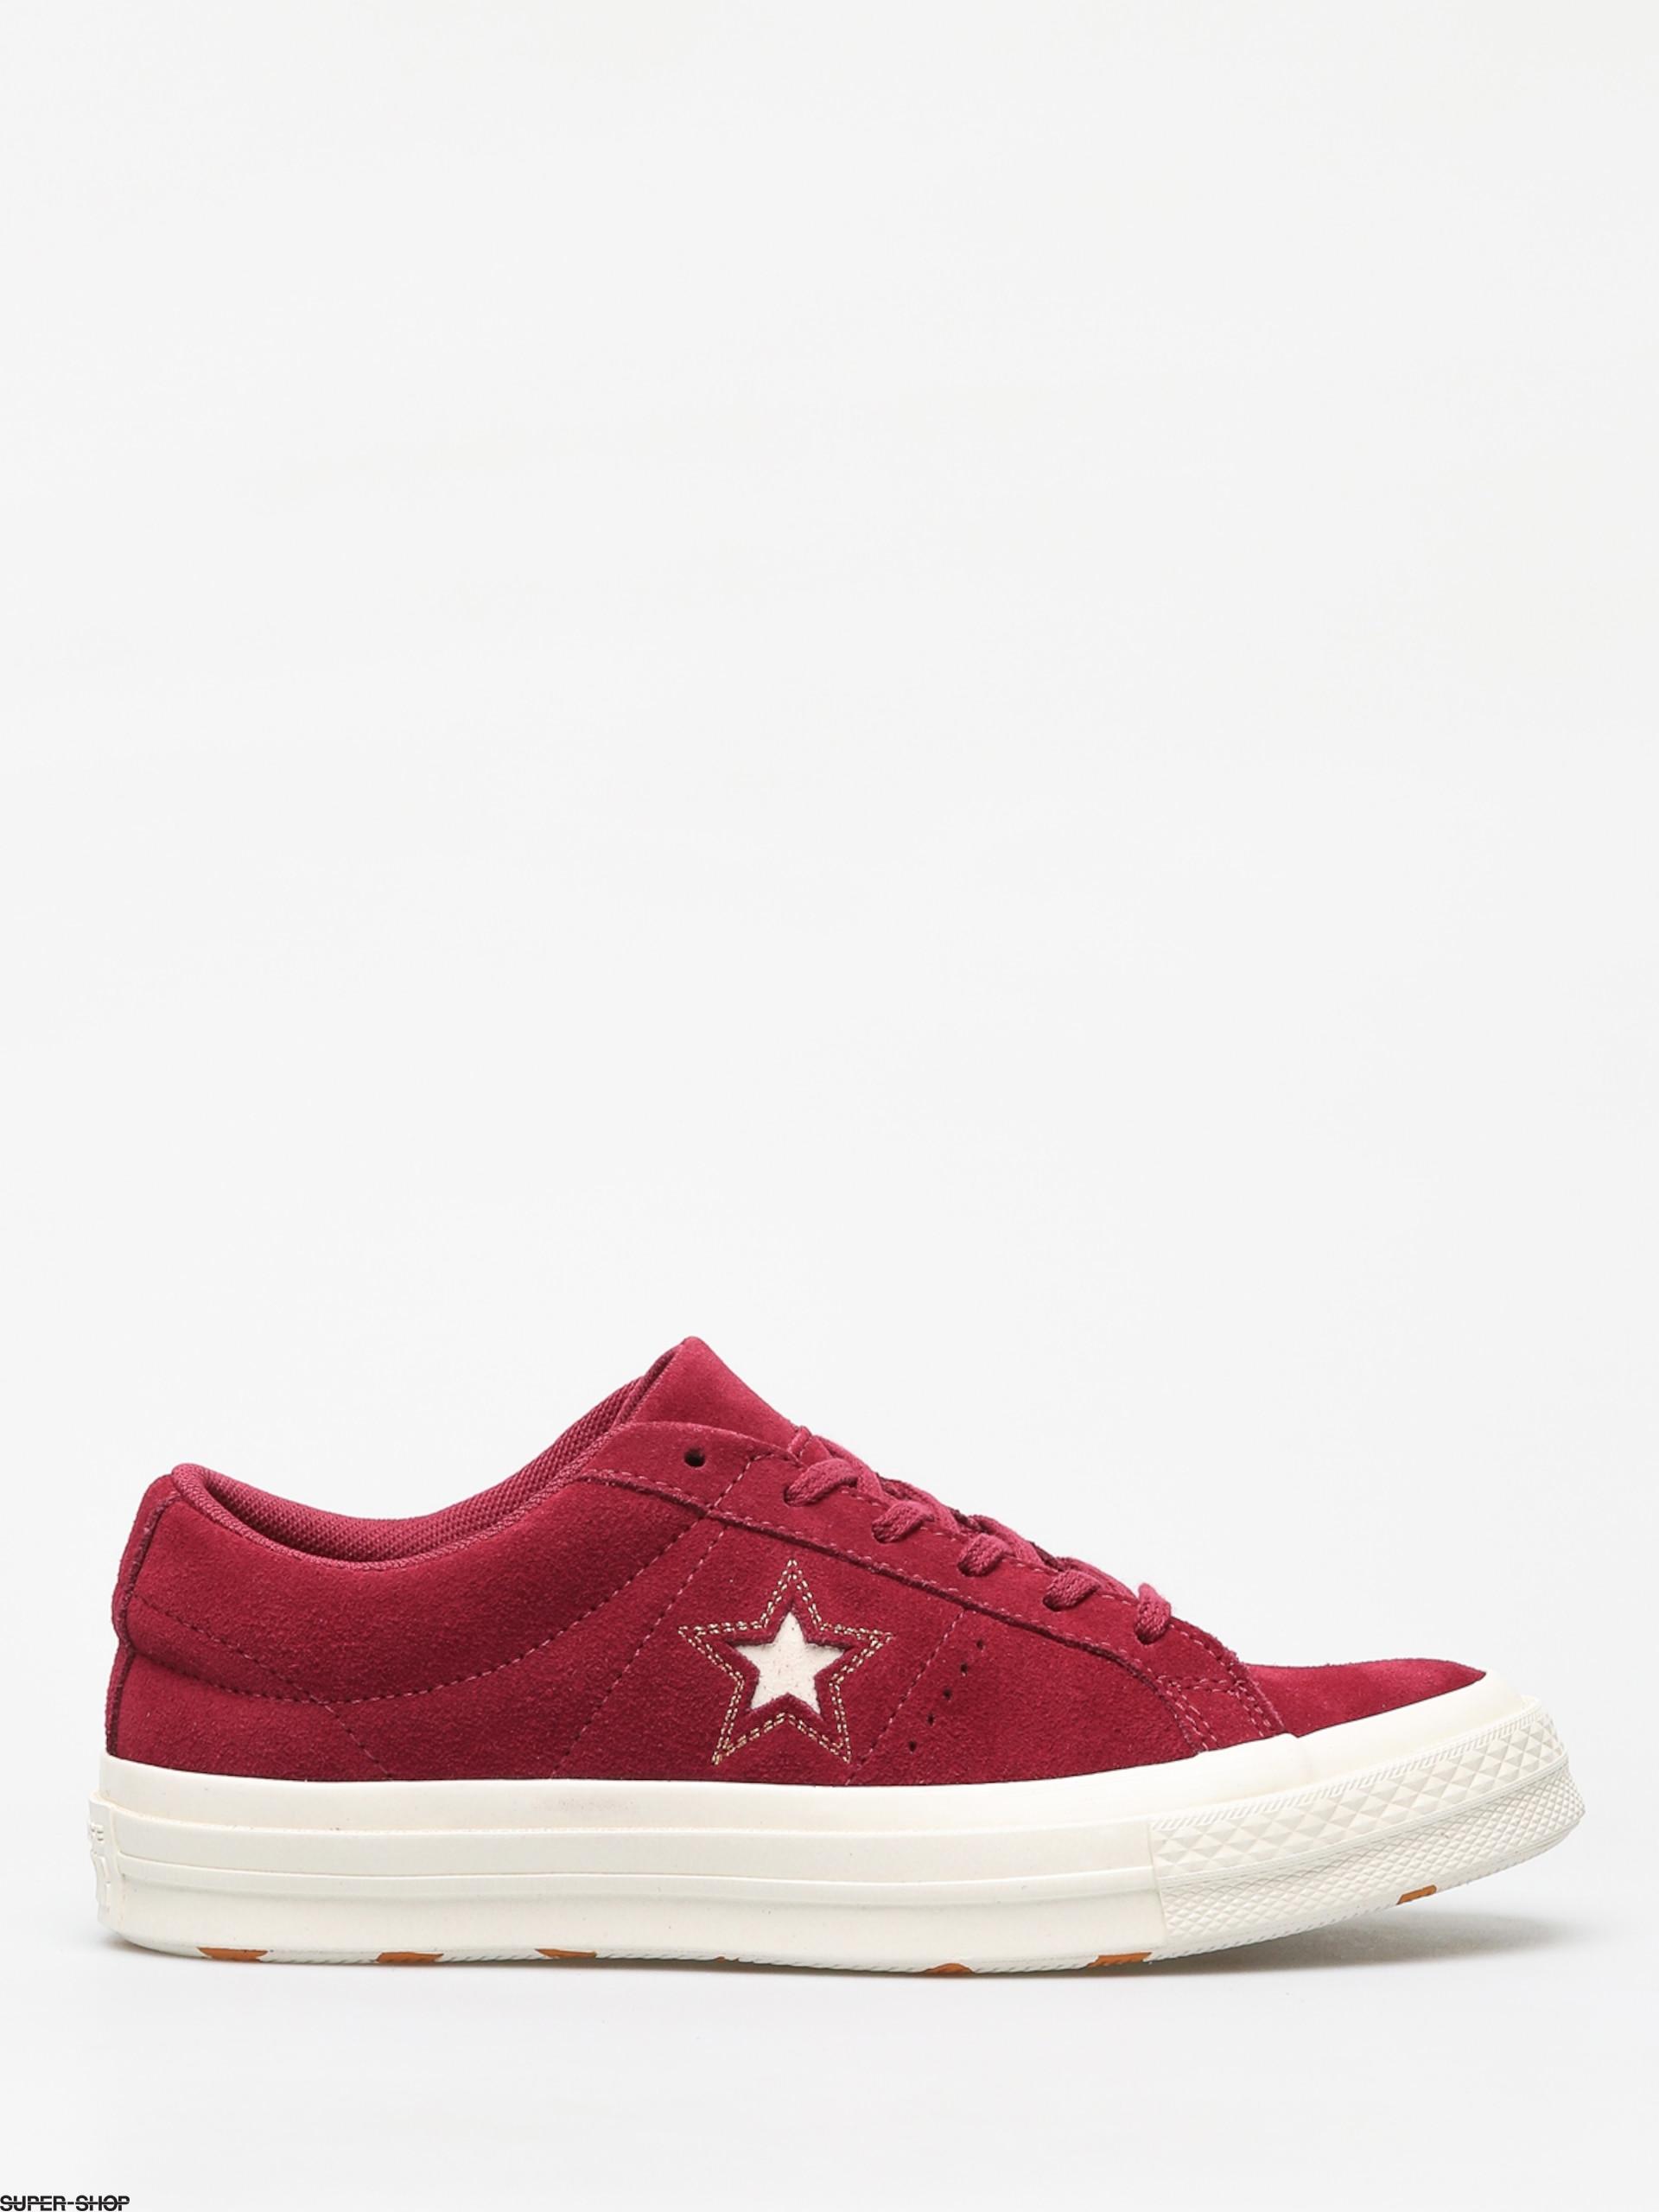 reasonably priced hot product designer fashion Converse One Star Ox Chucks (rhubarb/field orange/egret)